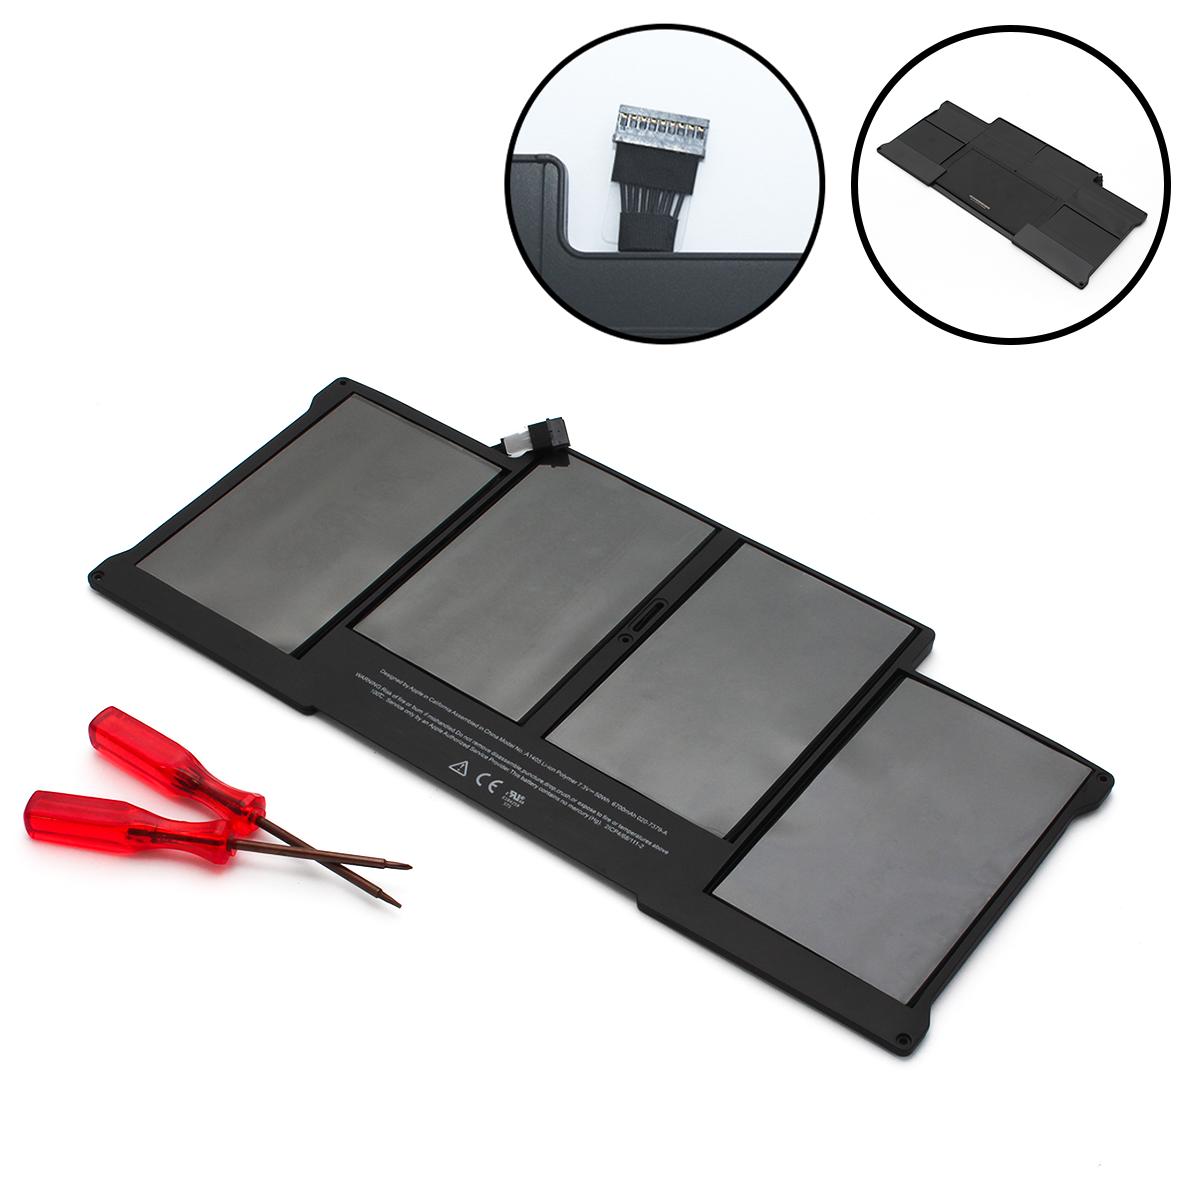 "Батарея, аккумулятор для MacBook Air 13"" 2011-2012 (A1369/a1466)"